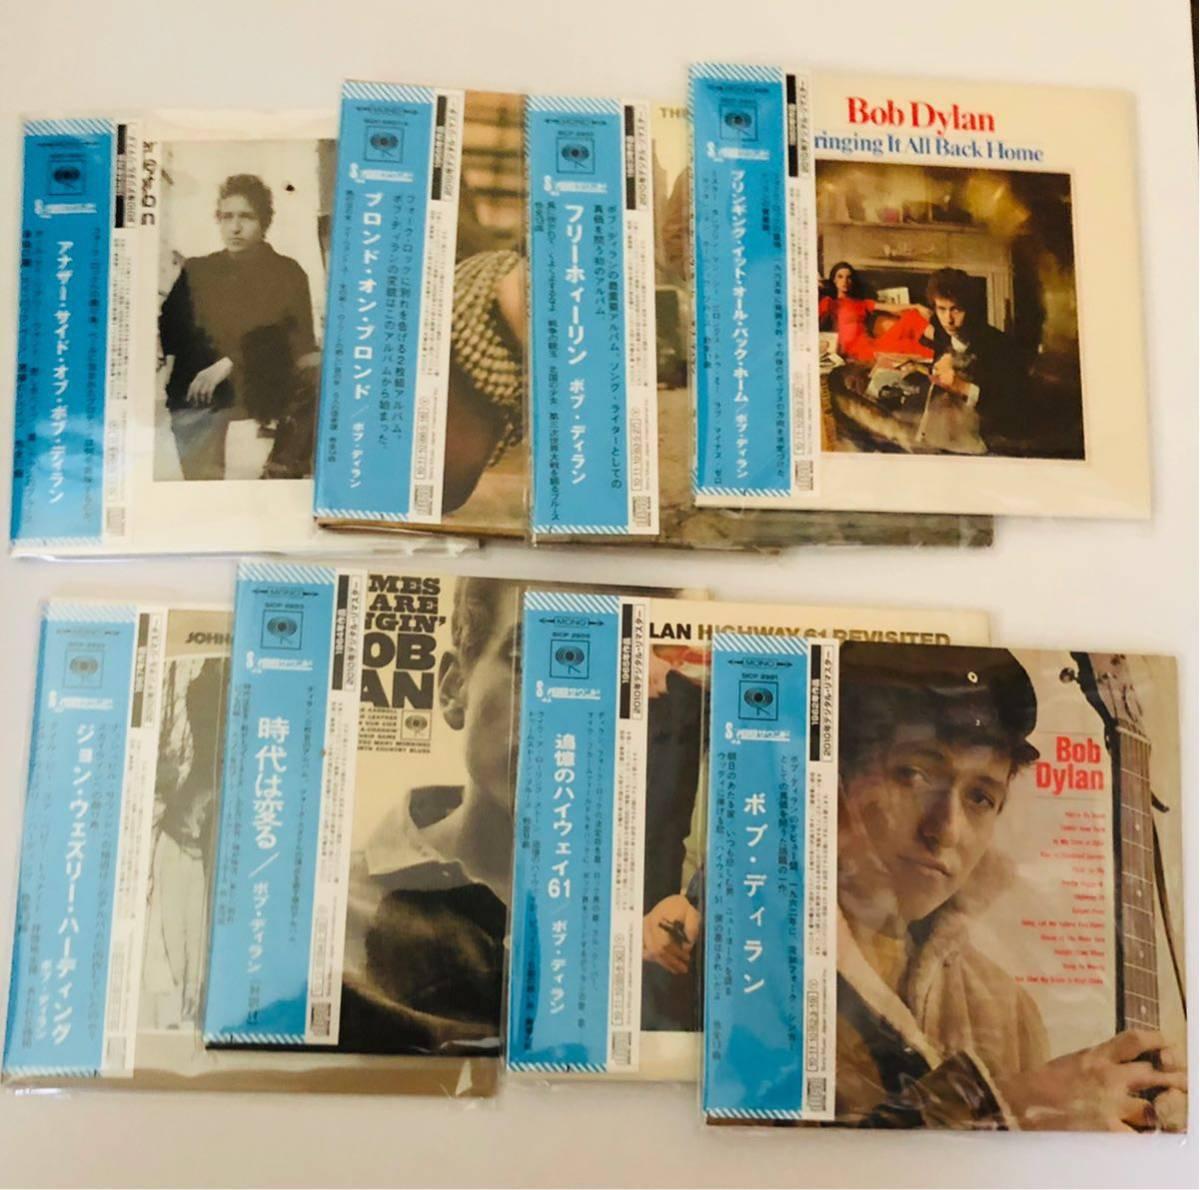 BOB DYLAN MONO BOX 9CD 国内 紙ジャケ キャップ帯付き 解説 日本語ブックレット